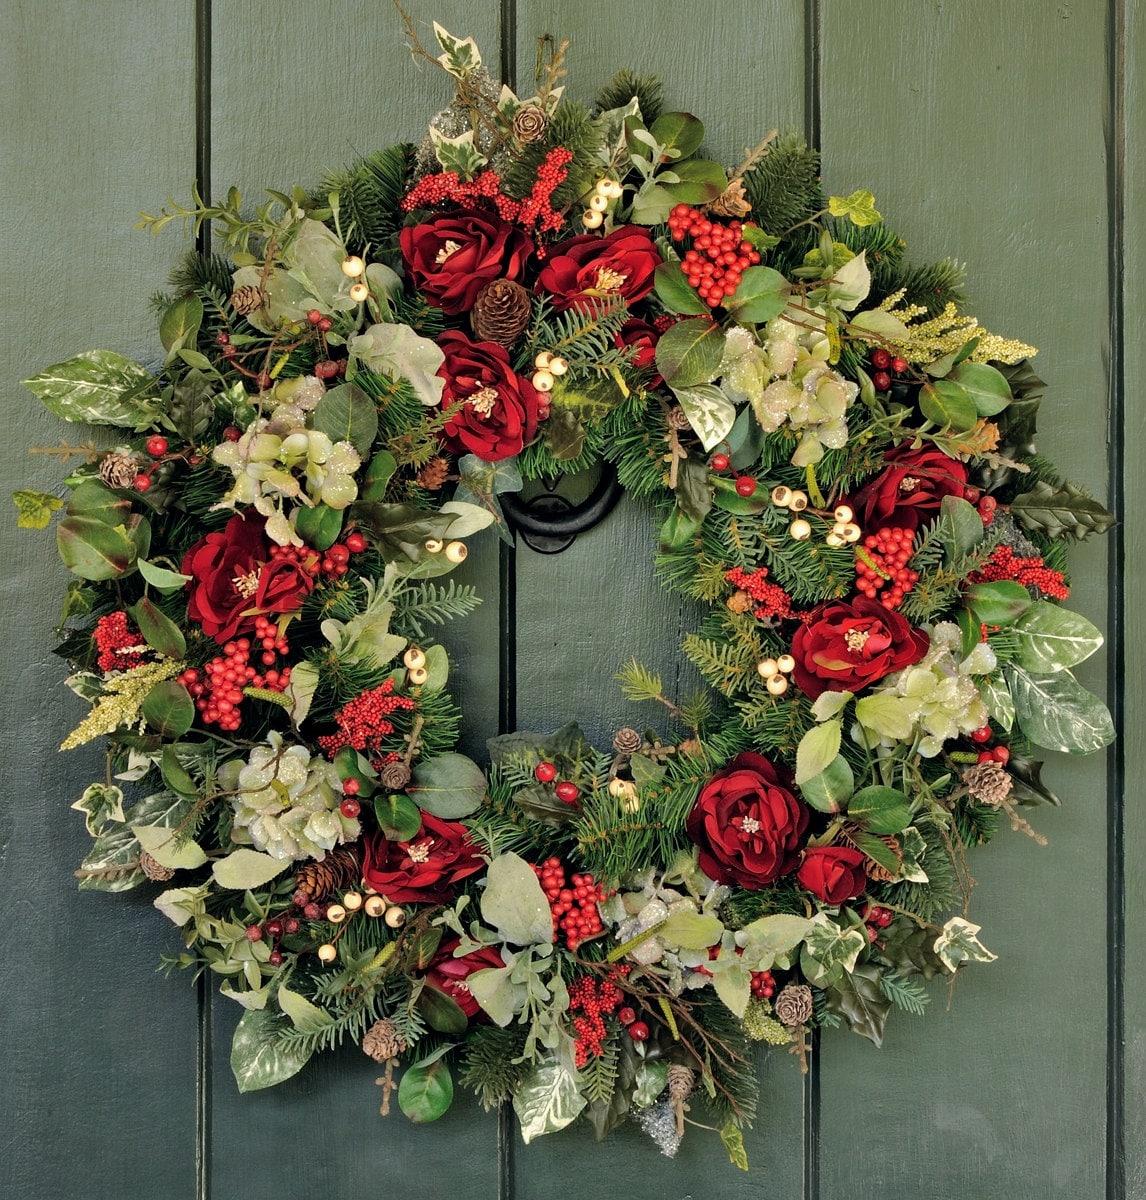 Elegant Christmas Hydrangea Rose and Pine Christmas Wreath